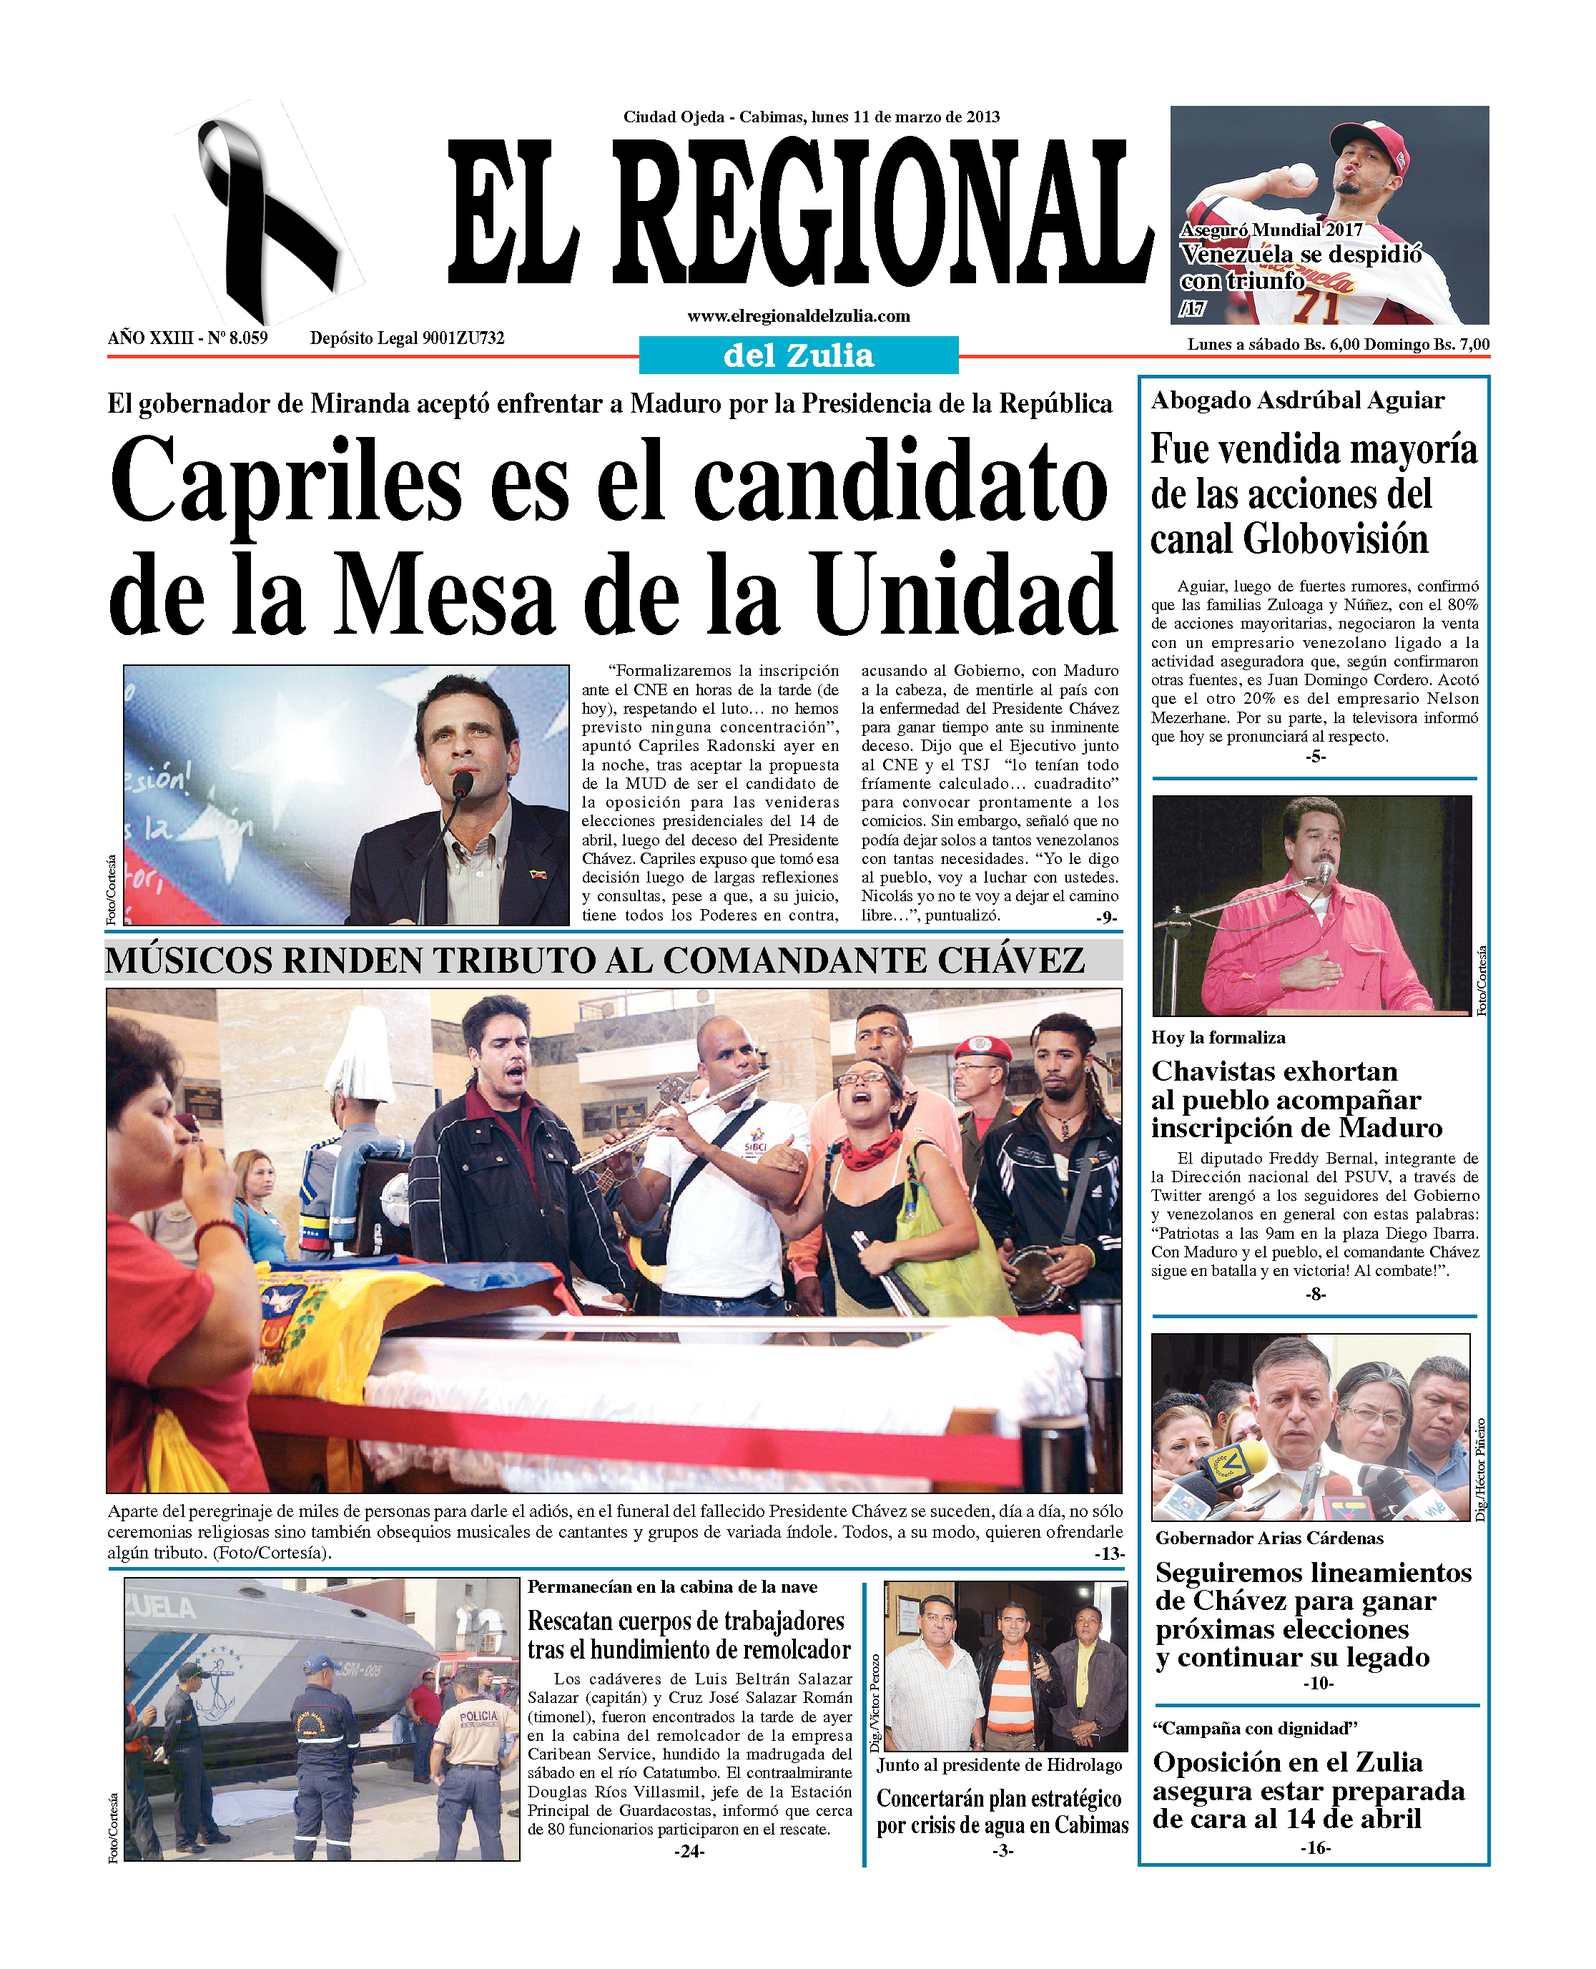 Calaméo - El Regional del Zulia 11-03-2013